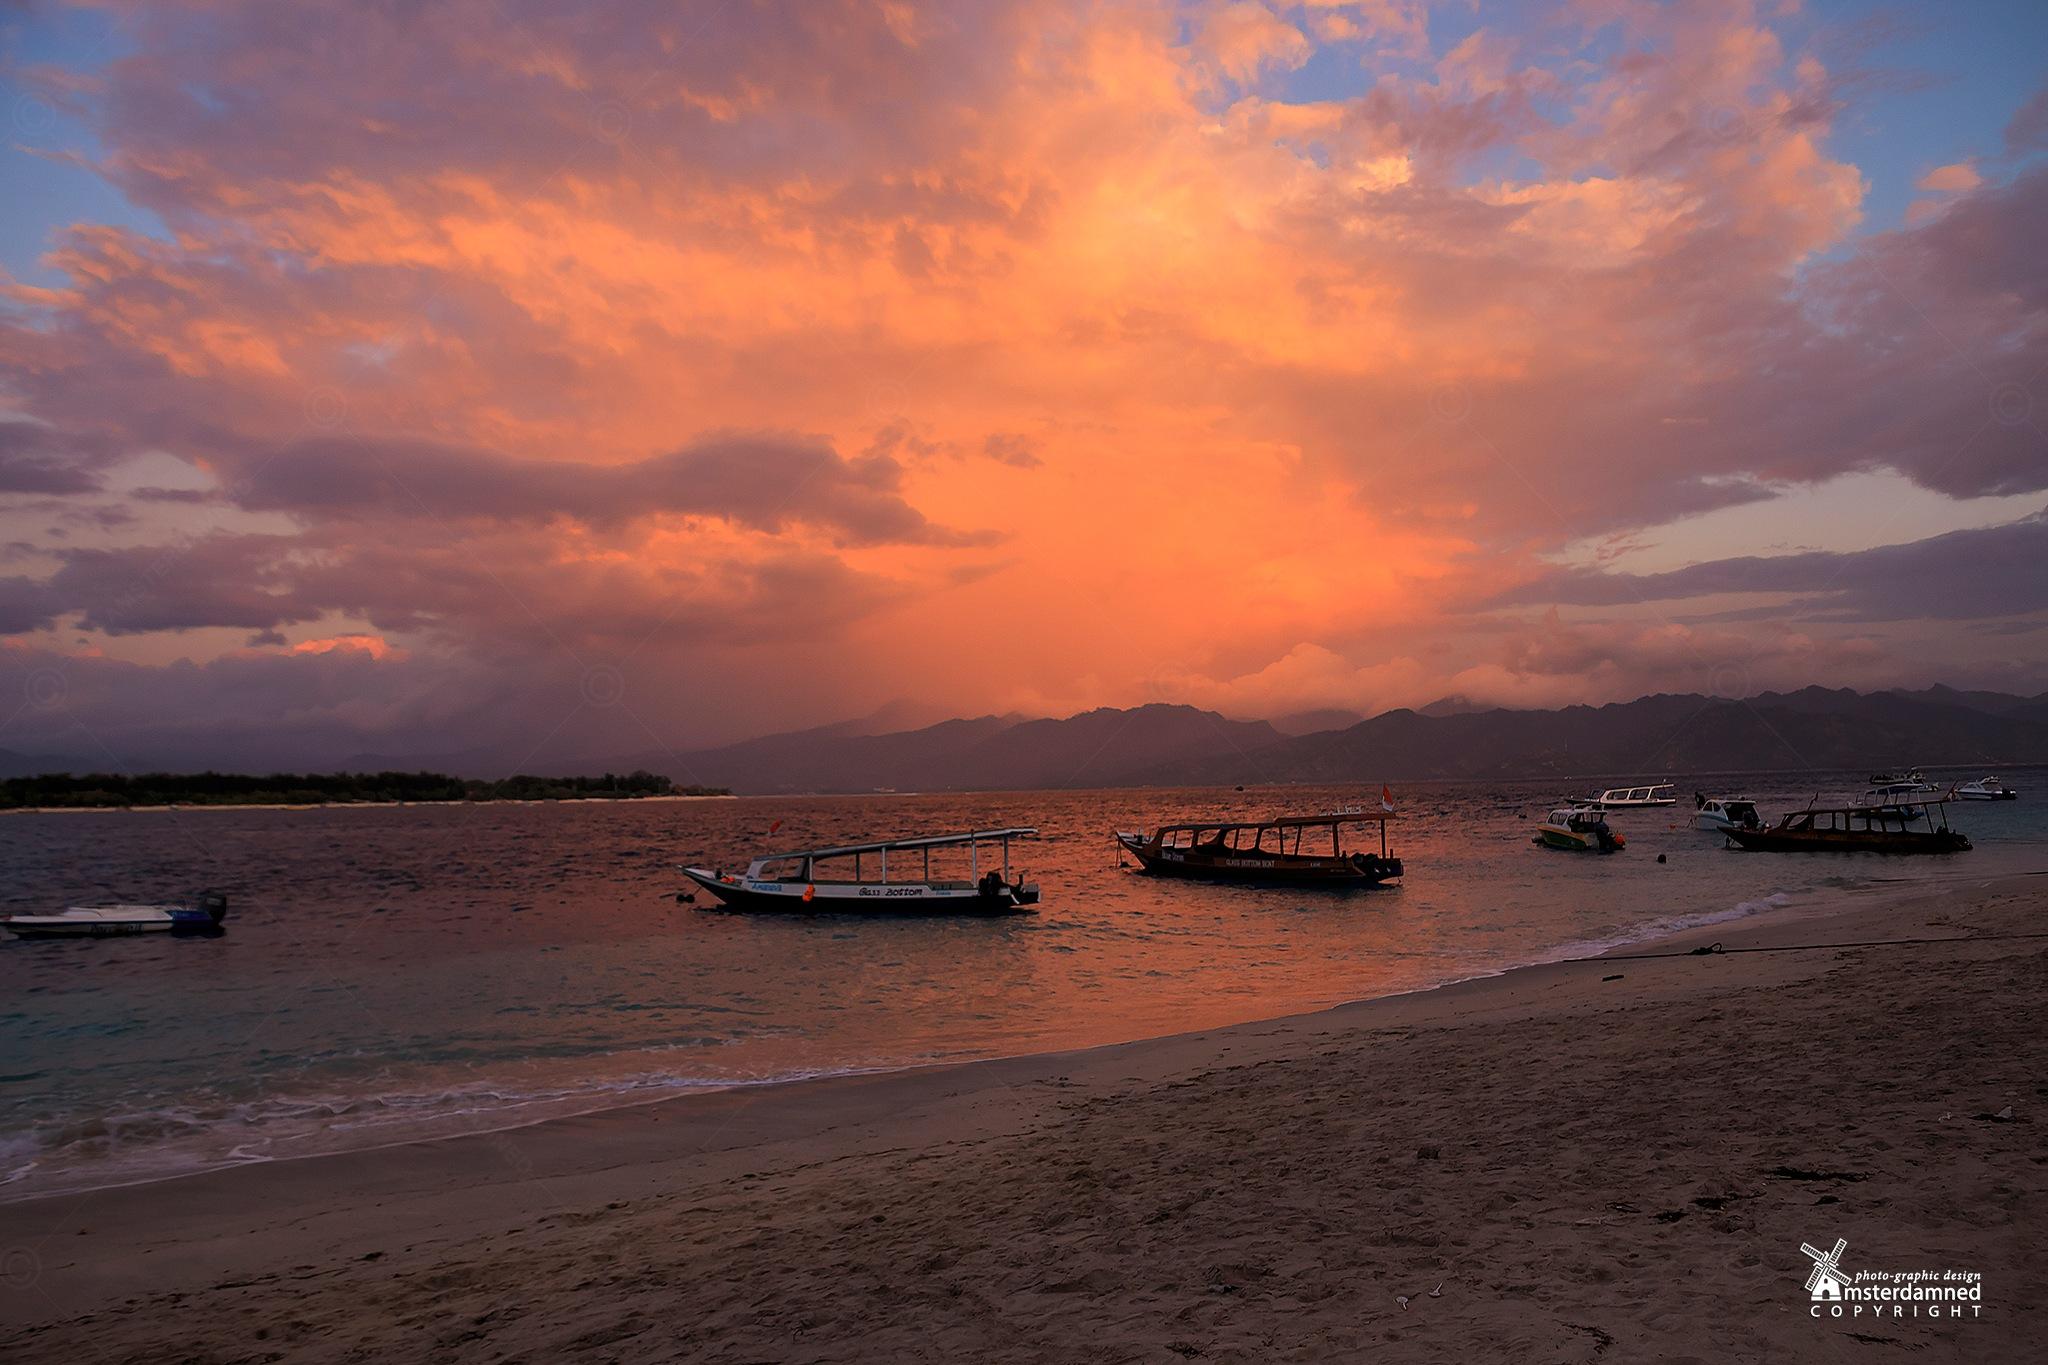 Gili Trawangan, (Lombok) Indonesia by Michael